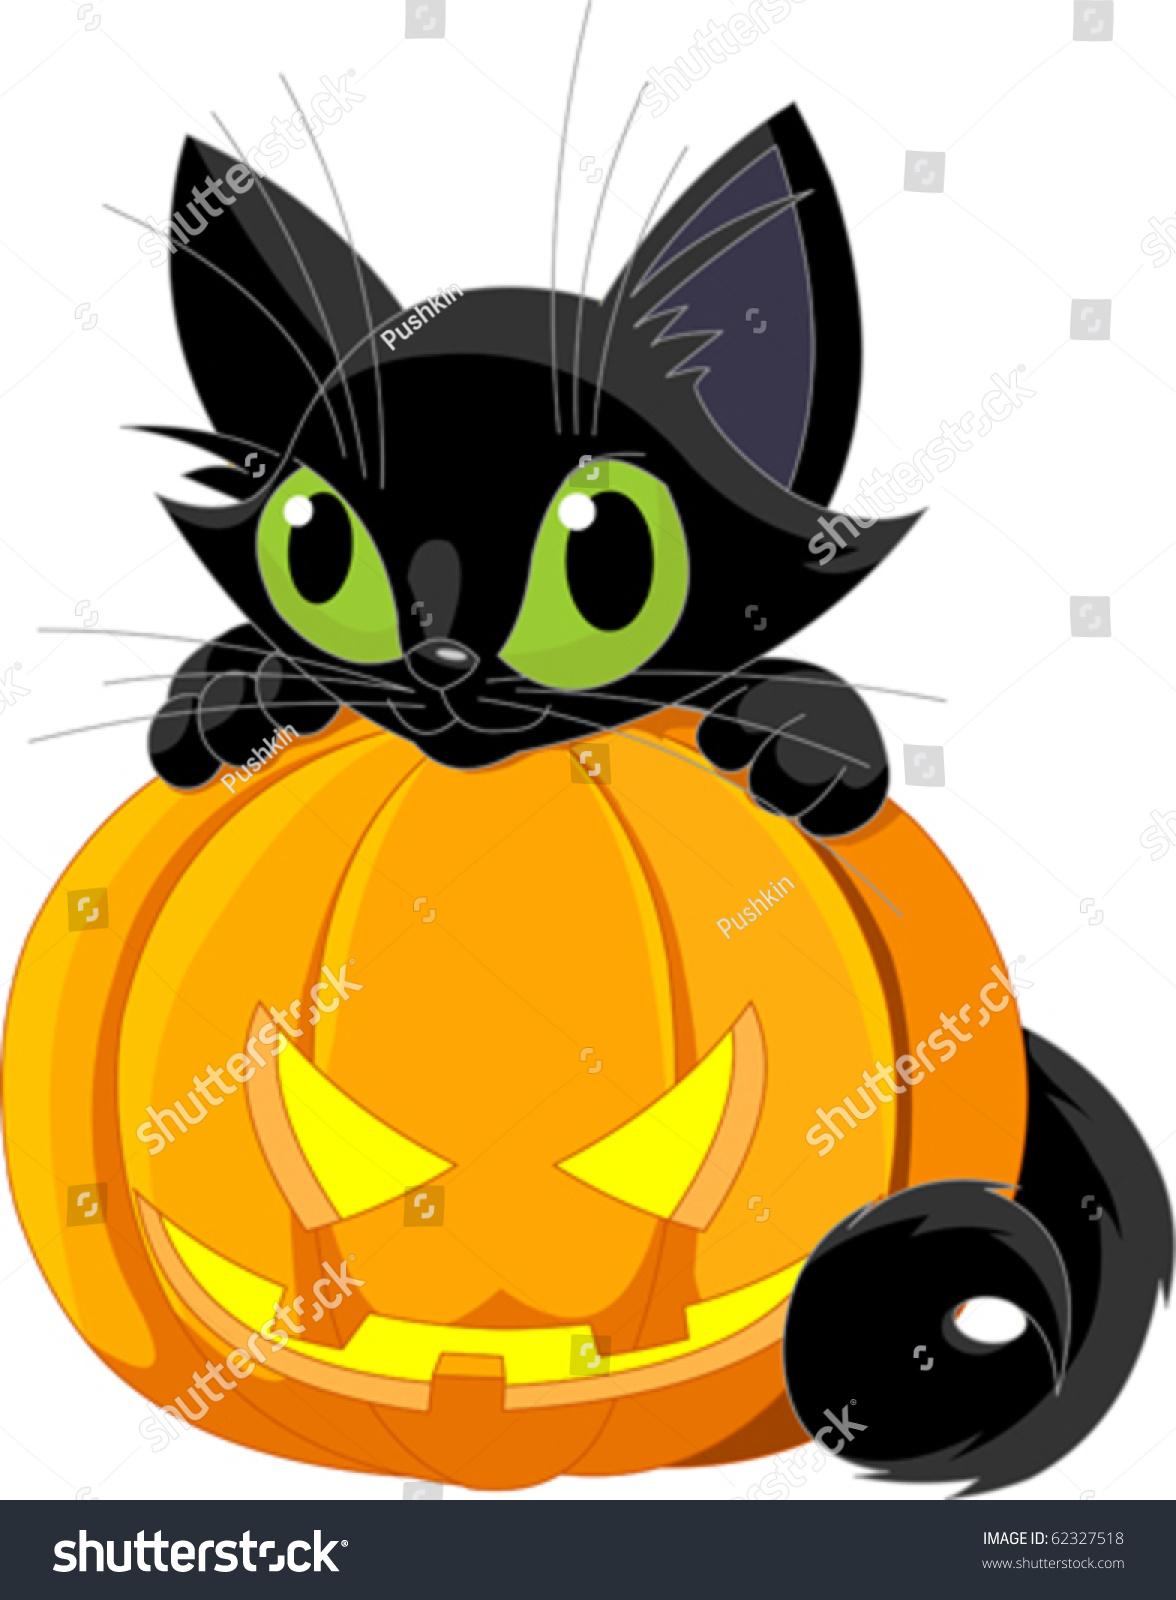 Cute Black Cat On Halloween Pumpkin Stock Vector 62327518 ...